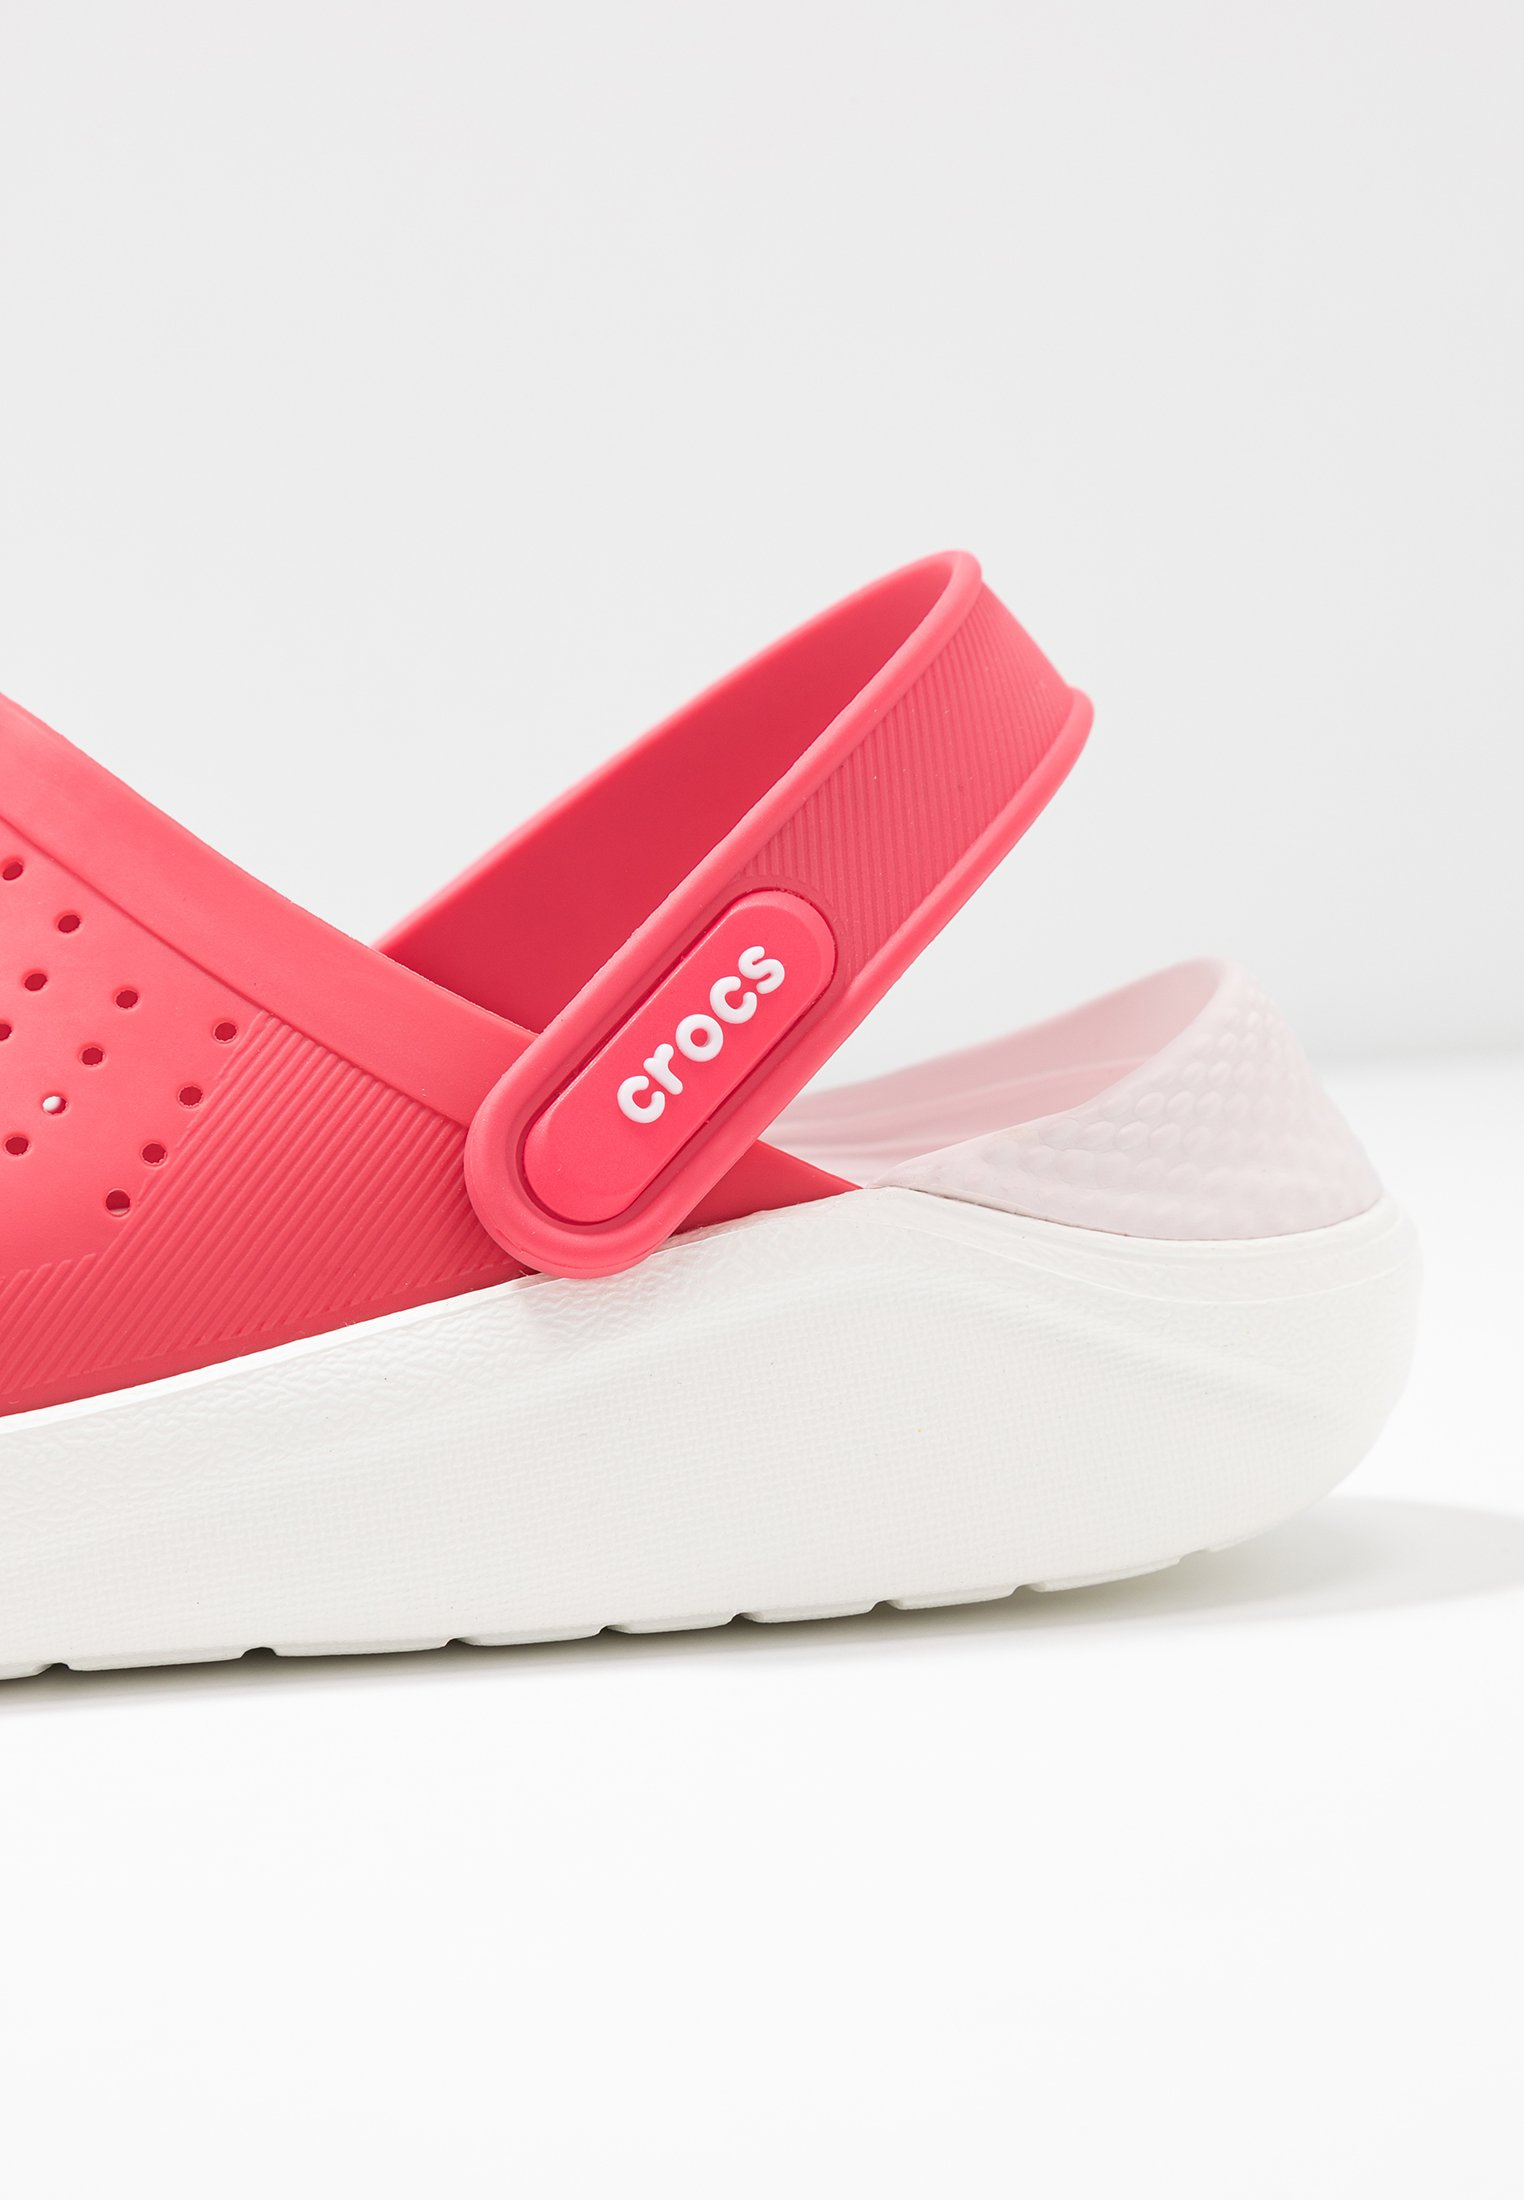 Red Red Crocs LiterideCiabattine Crocs Red Crocs LiterideCiabattine LiterideCiabattine Crocs m0wnN8